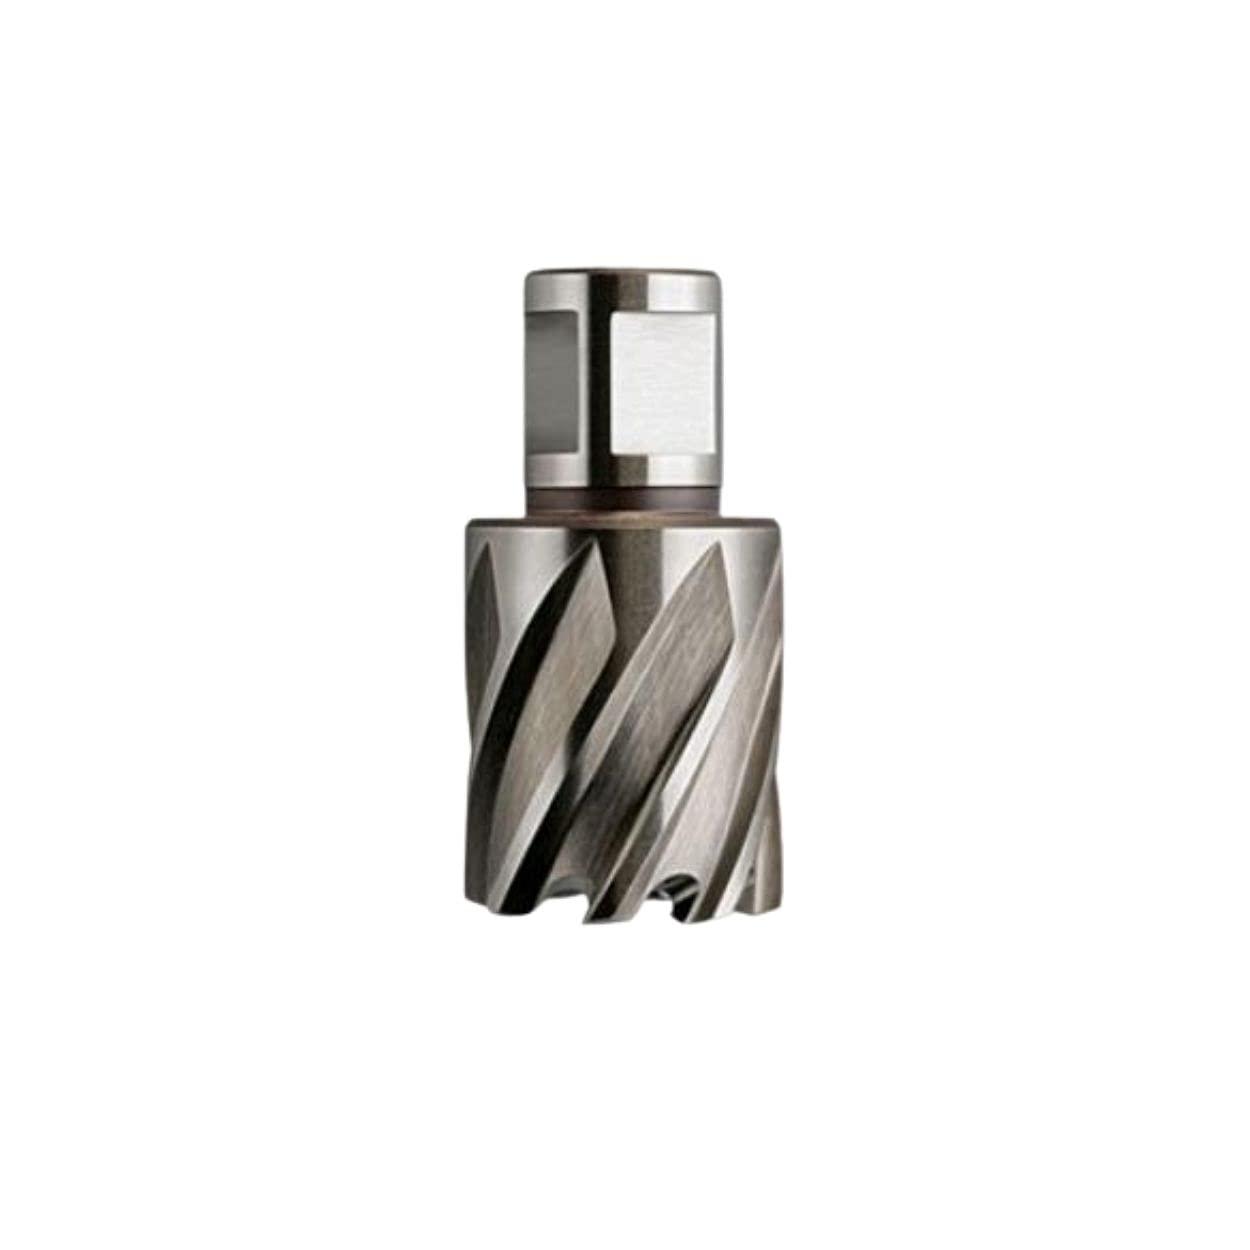 Jancy Slugger by Fein - store HSS with sale High Cutter M2 Premium Annular